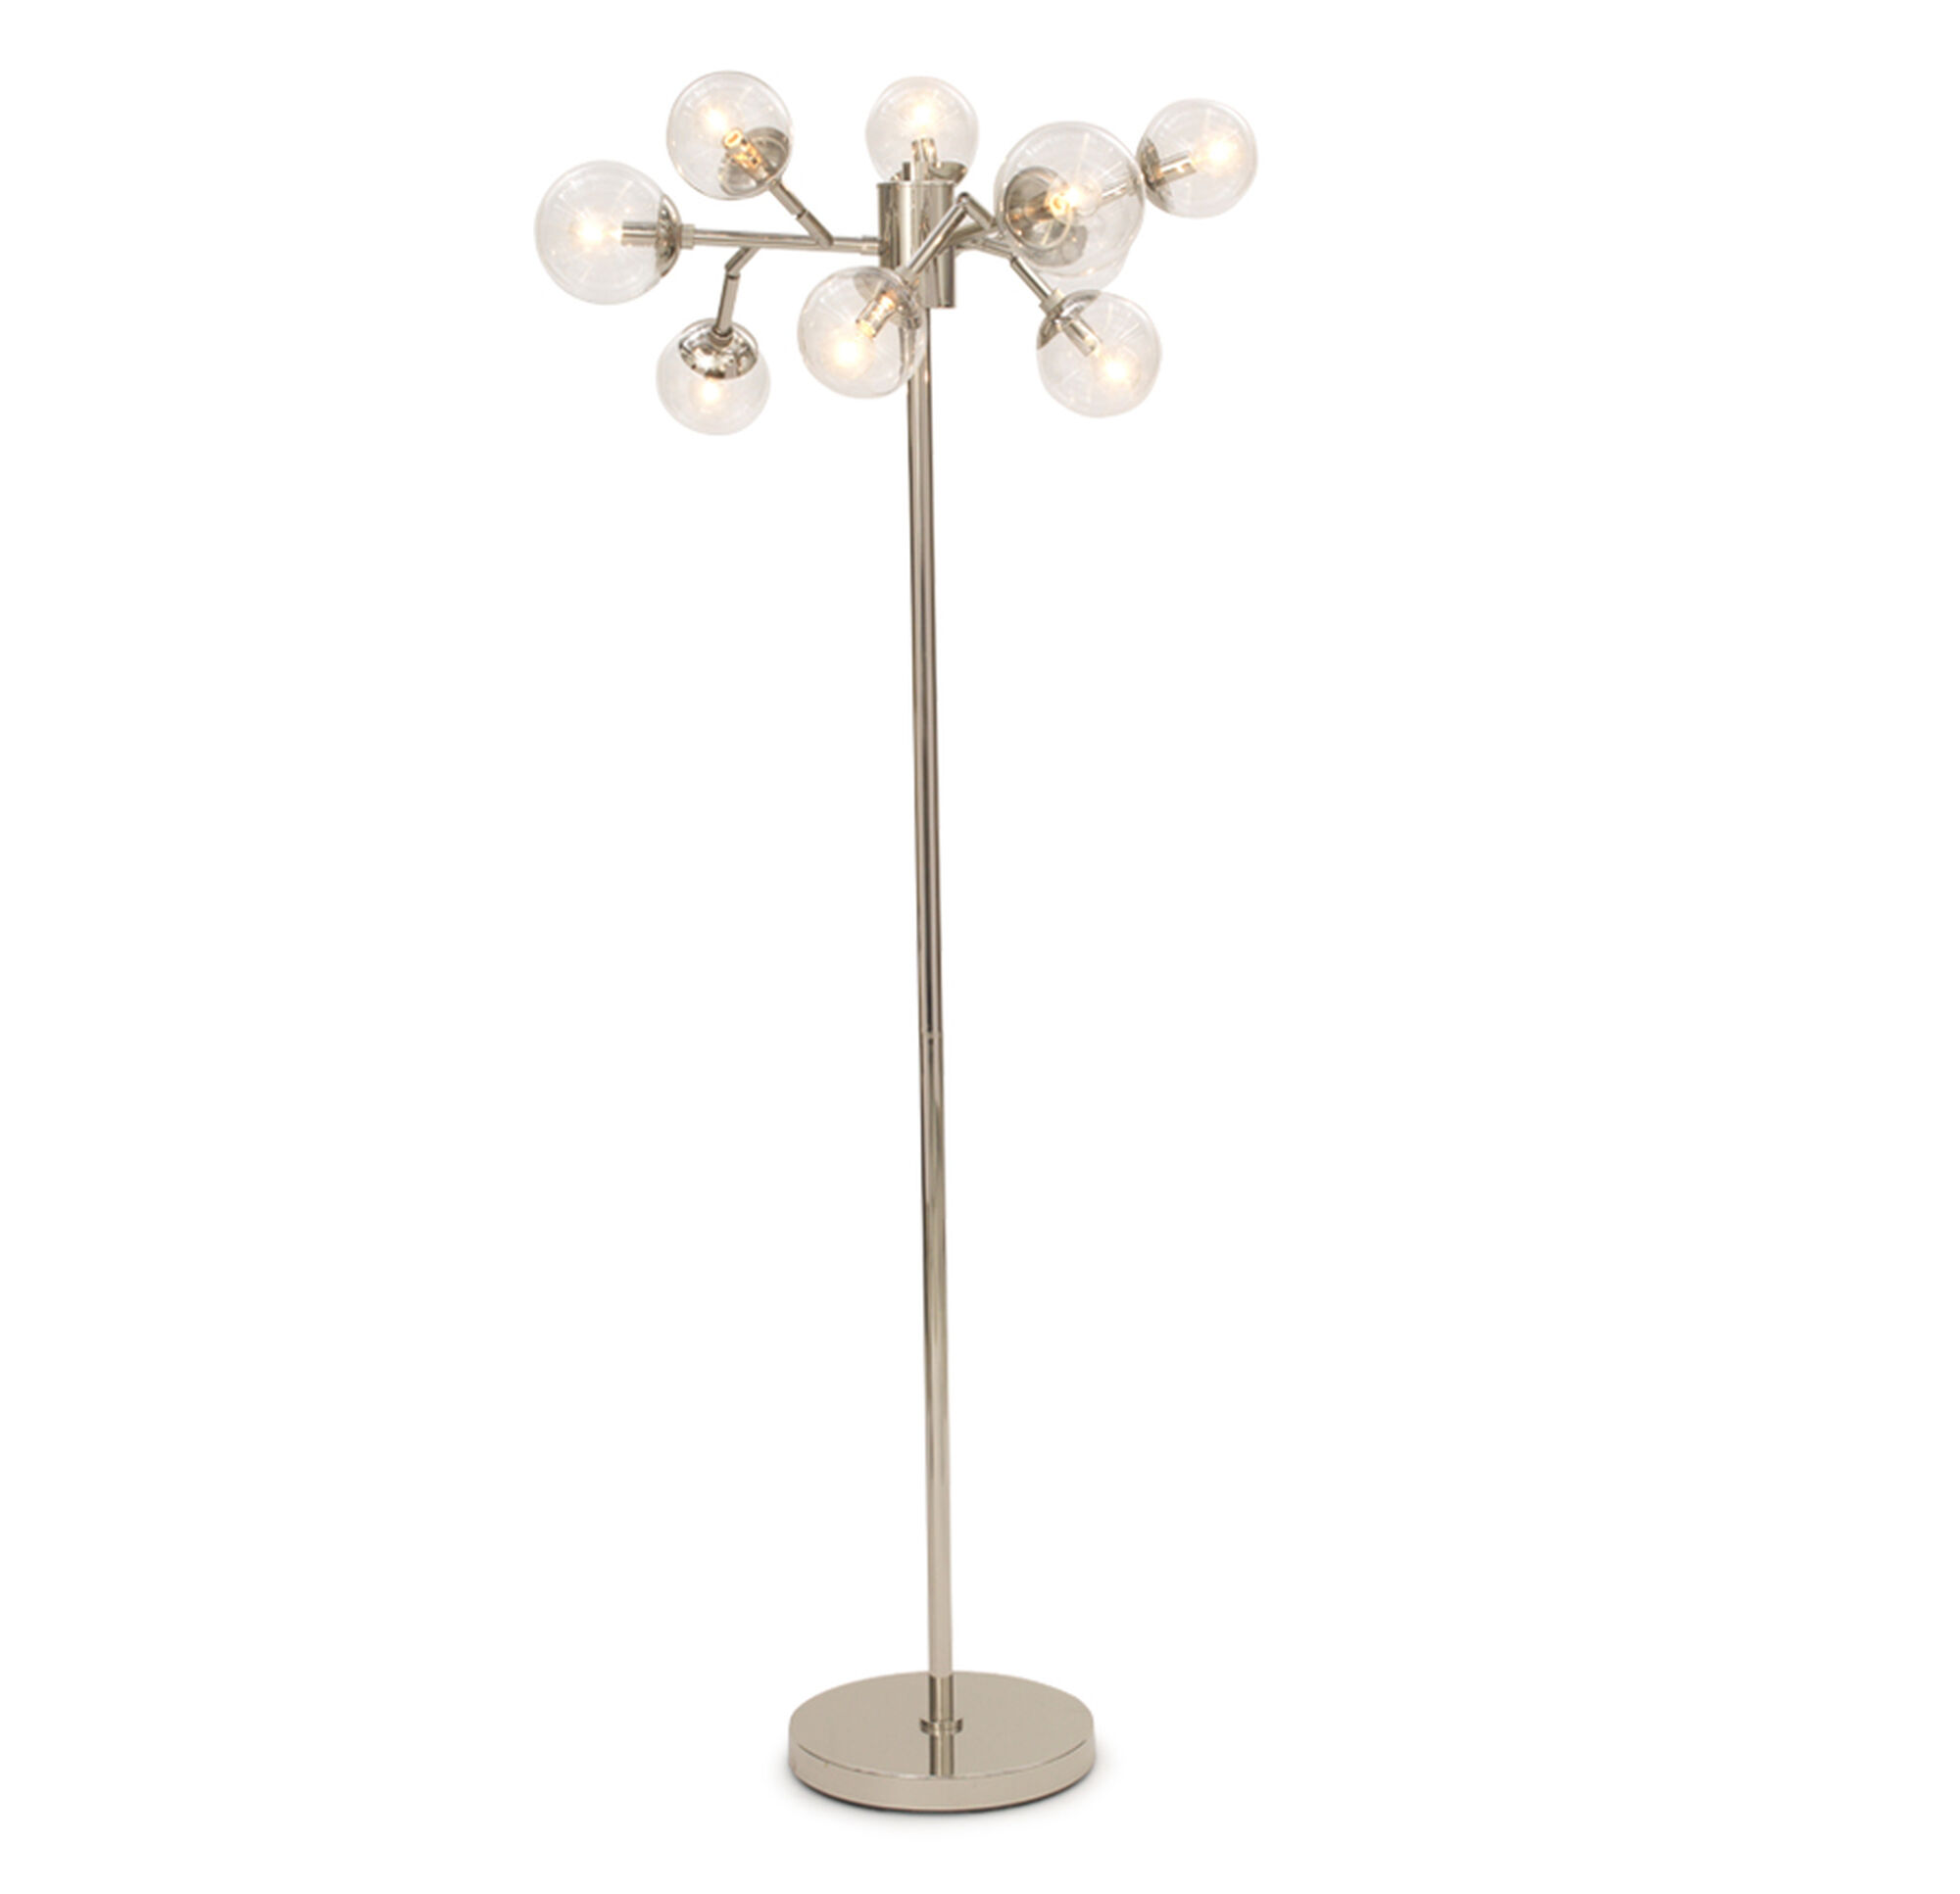 SAVOY FLOOR LAMP - POLISHED NICKEL